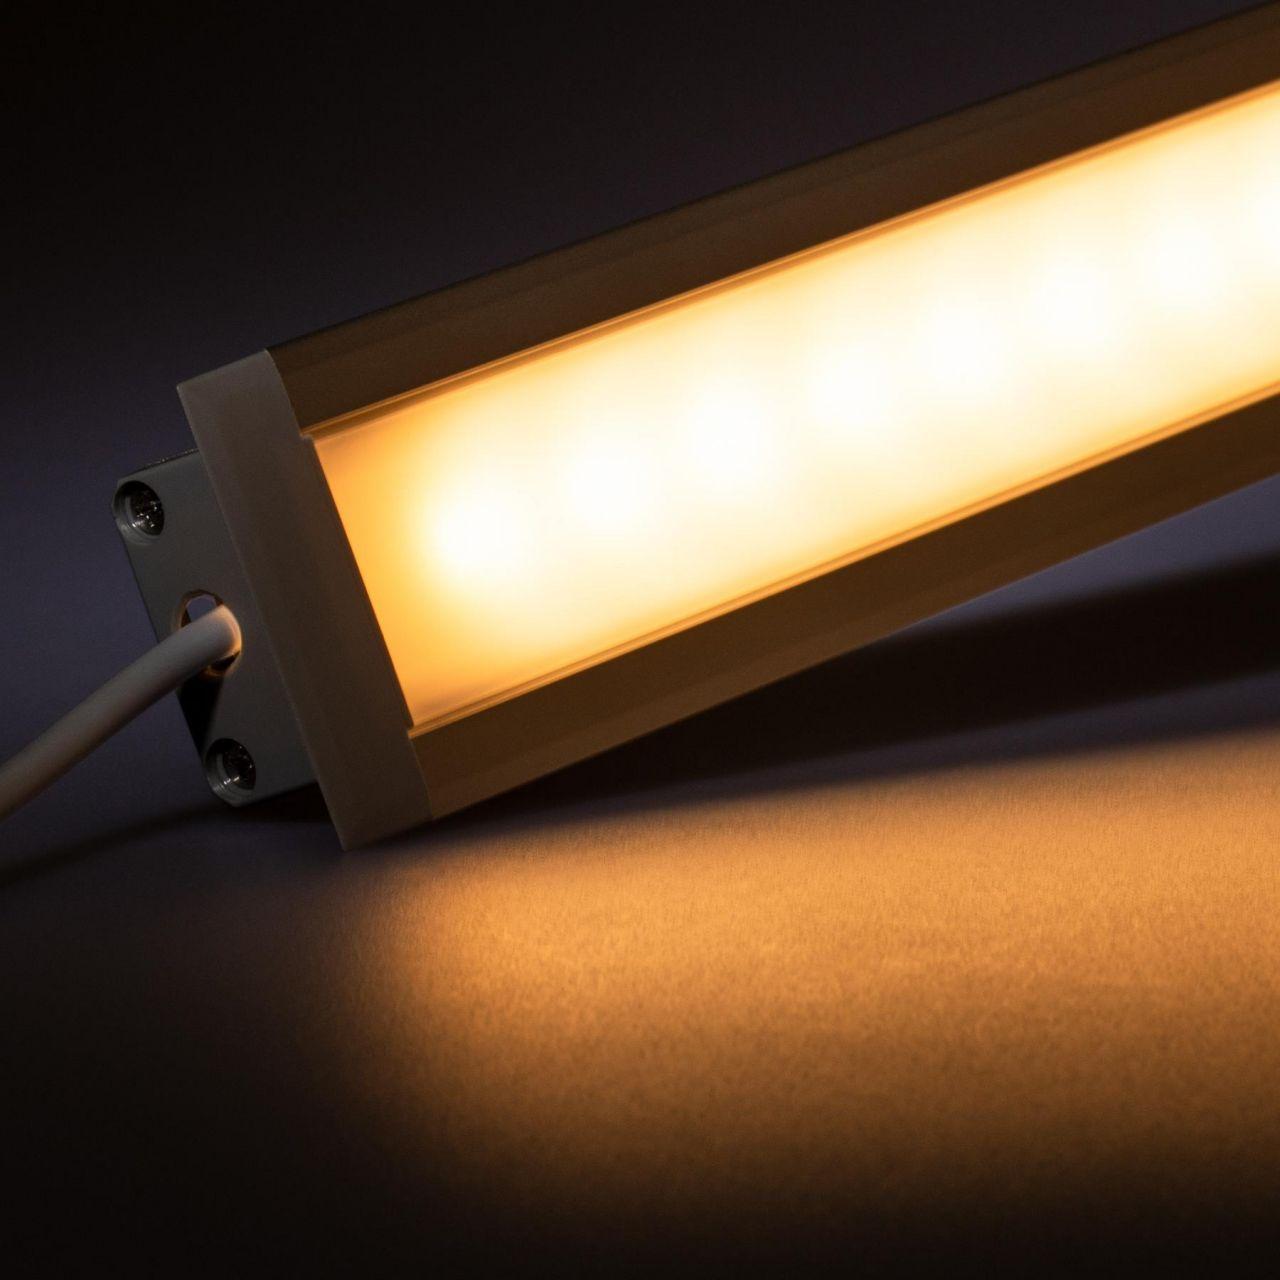 12V Aluminium Einbau LED Leiste – warmweiß – diffuse Abdeckung